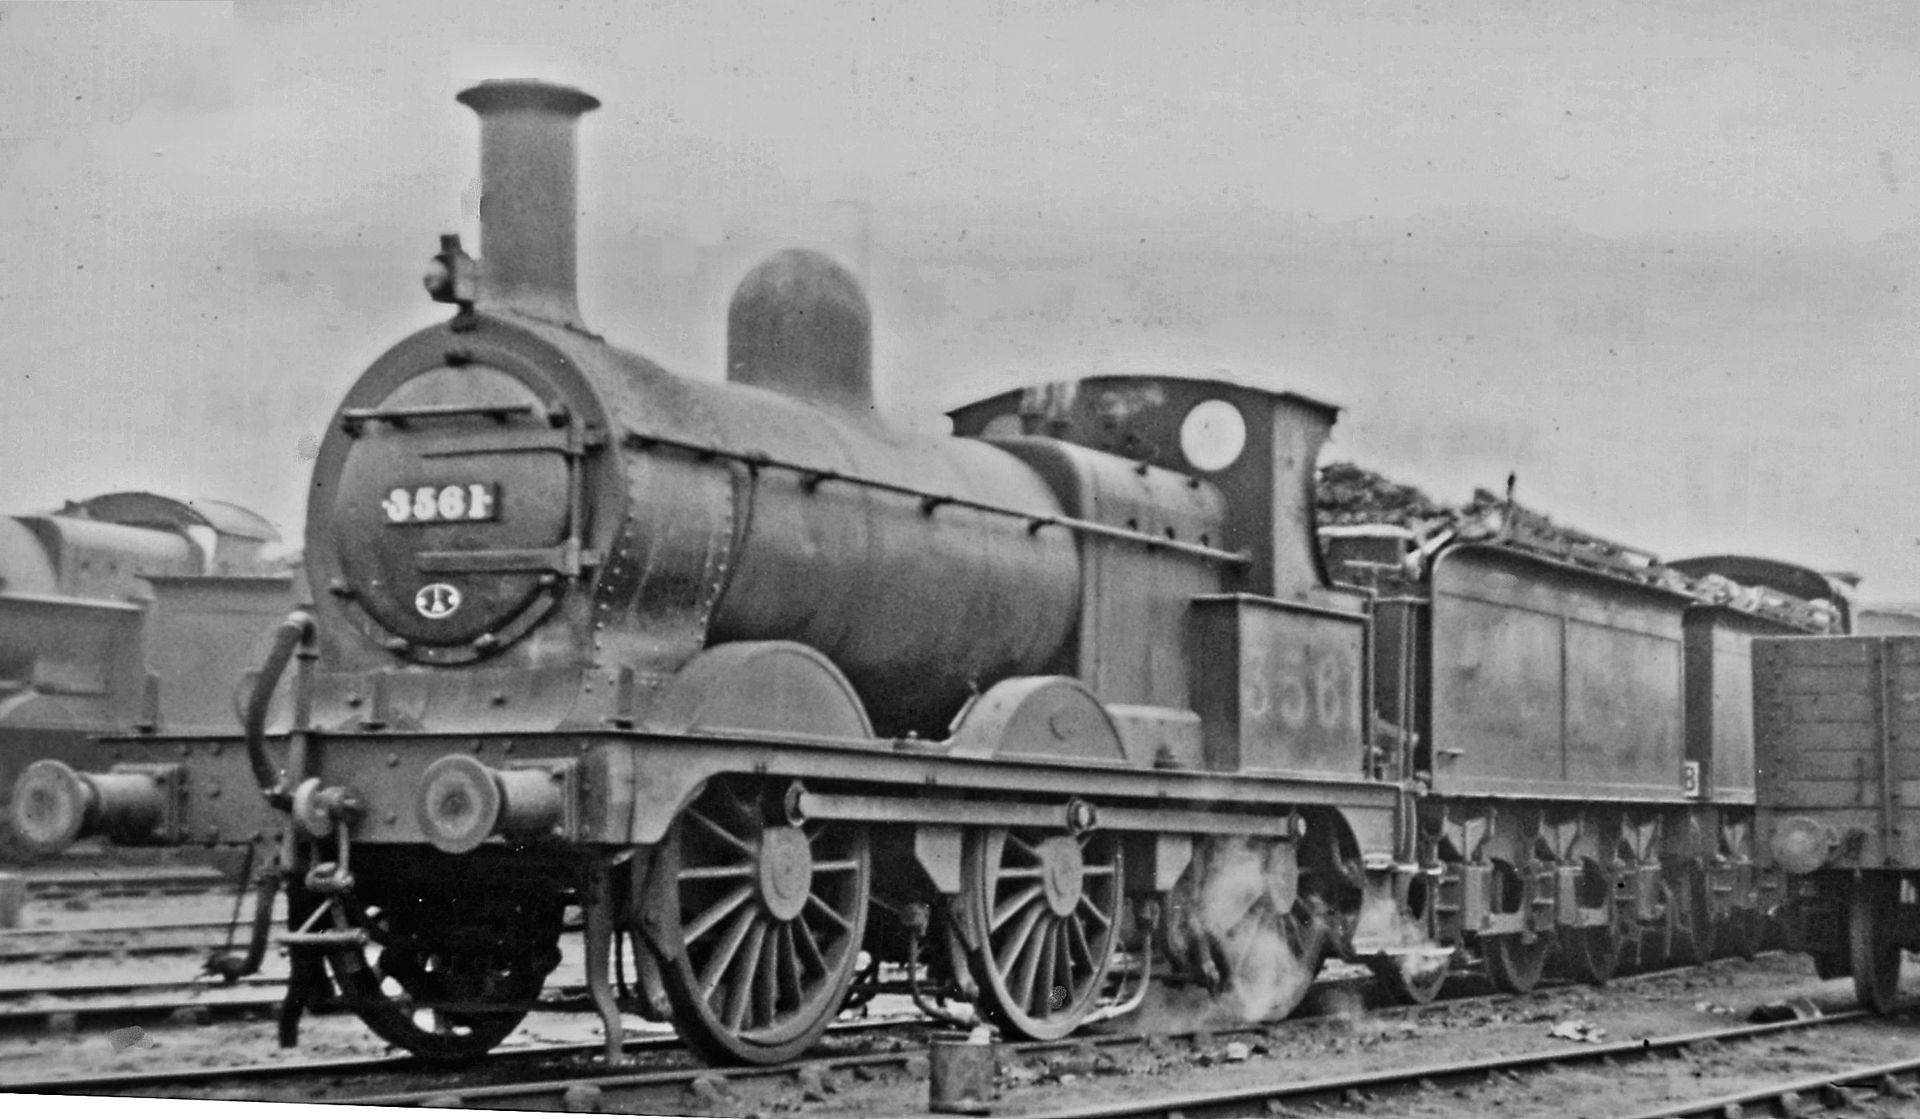 3561 at Willesden Loco Depot in April 1946. ©Ben Brooksbank